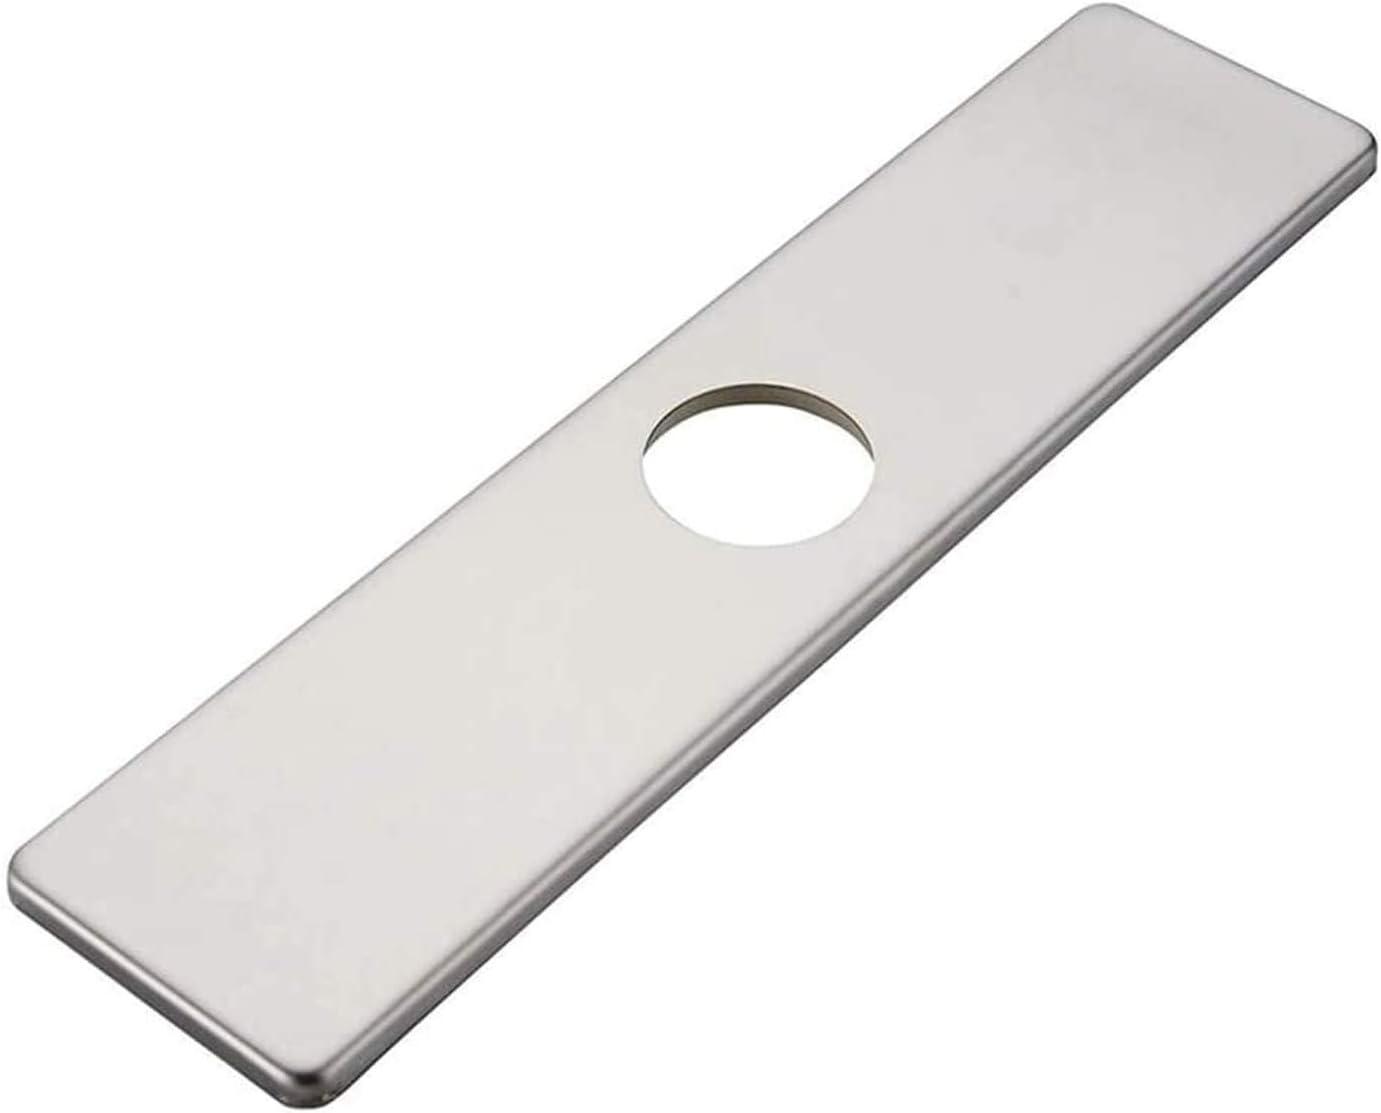 AntDesign 10 Kitchen Sink Faucet Hole Cover Deck Plate Escutcheon ...